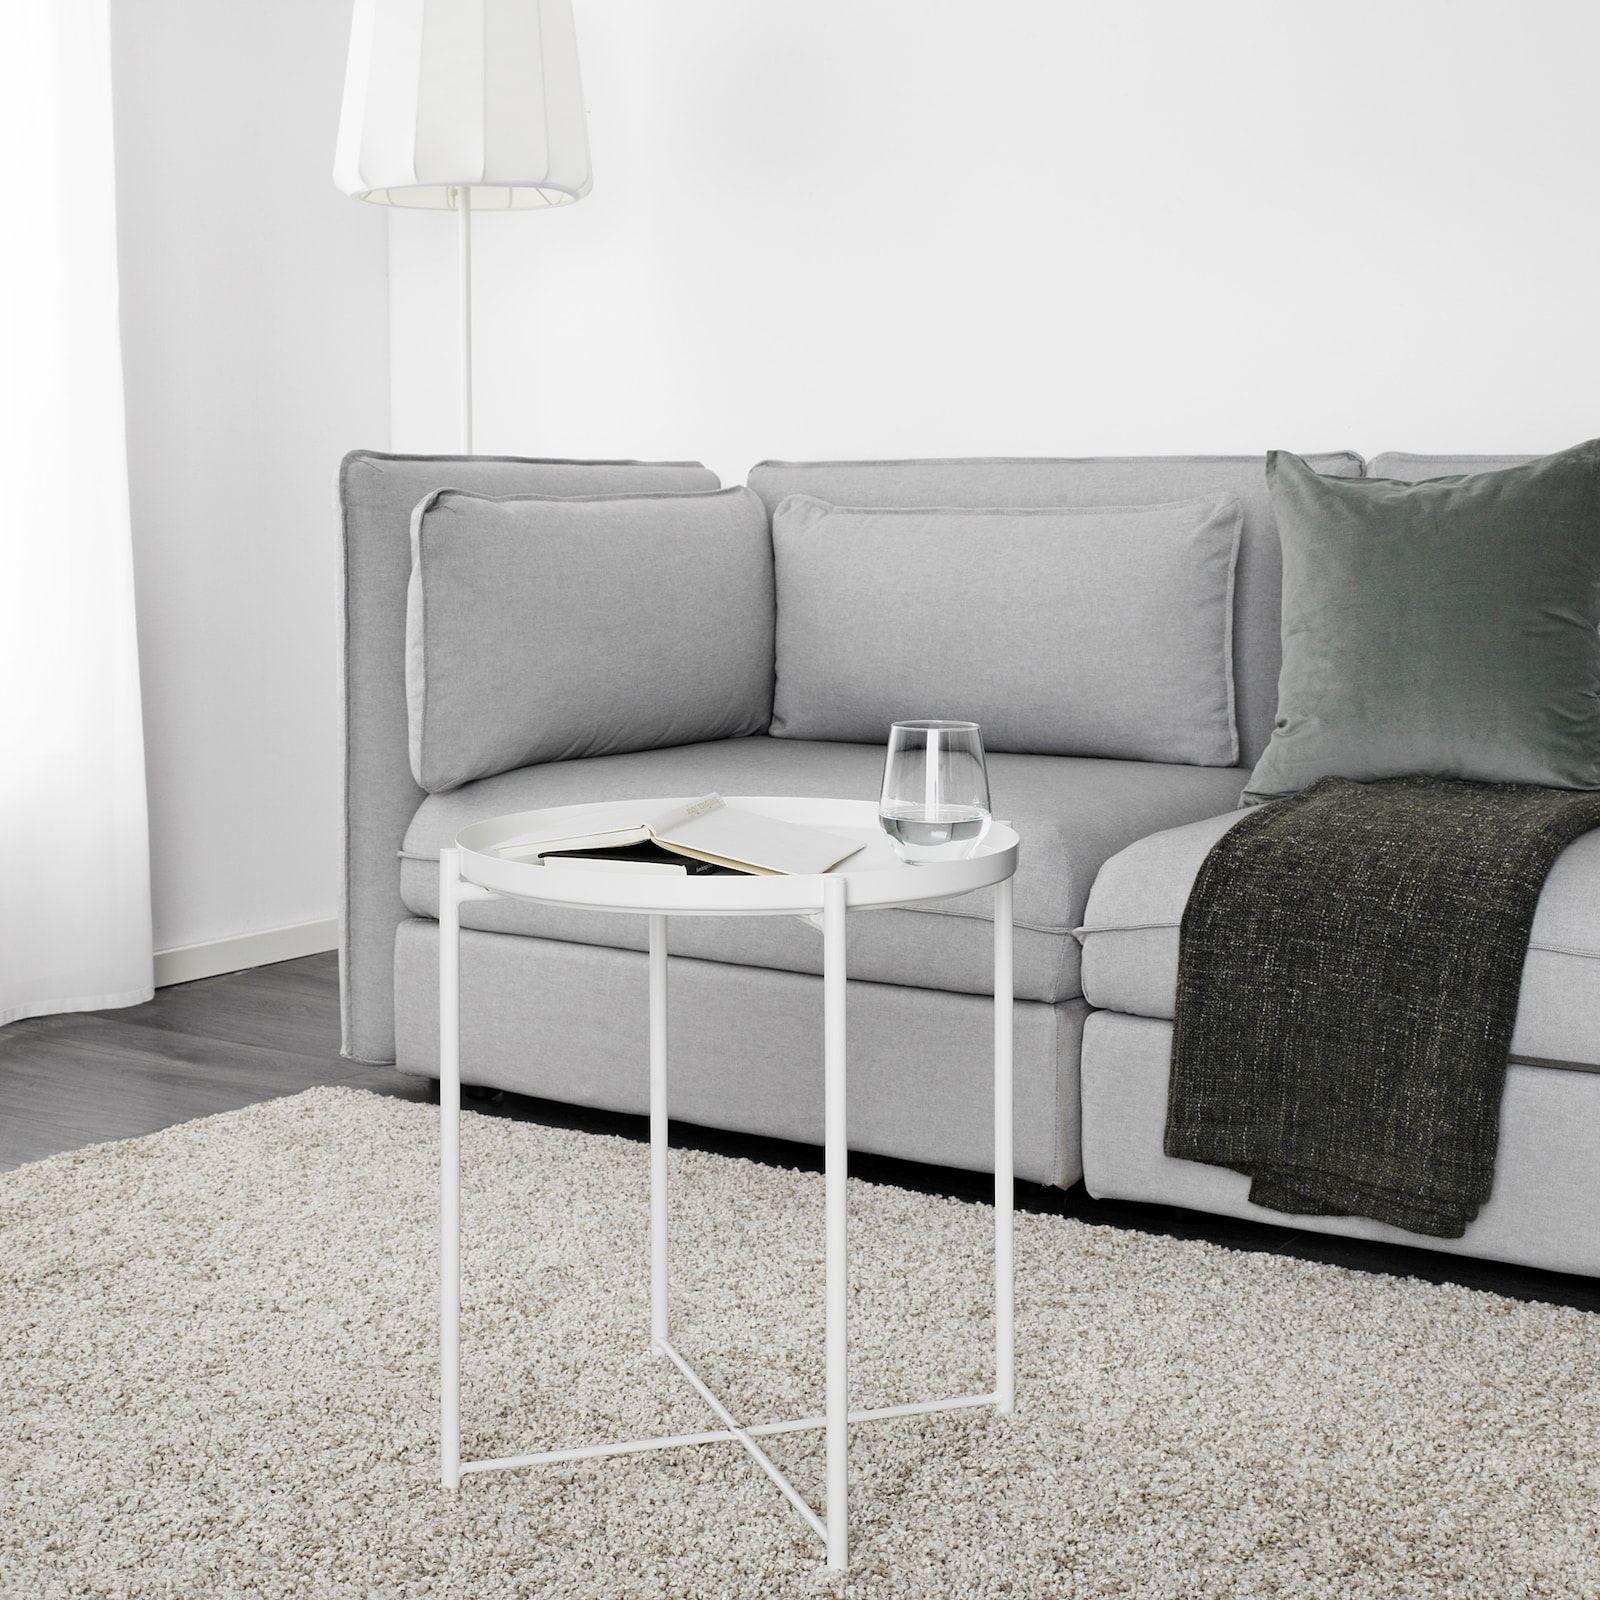 "GLADOM Tray table, white, 17 1/2x20 5/8"" IKEA in 2020"